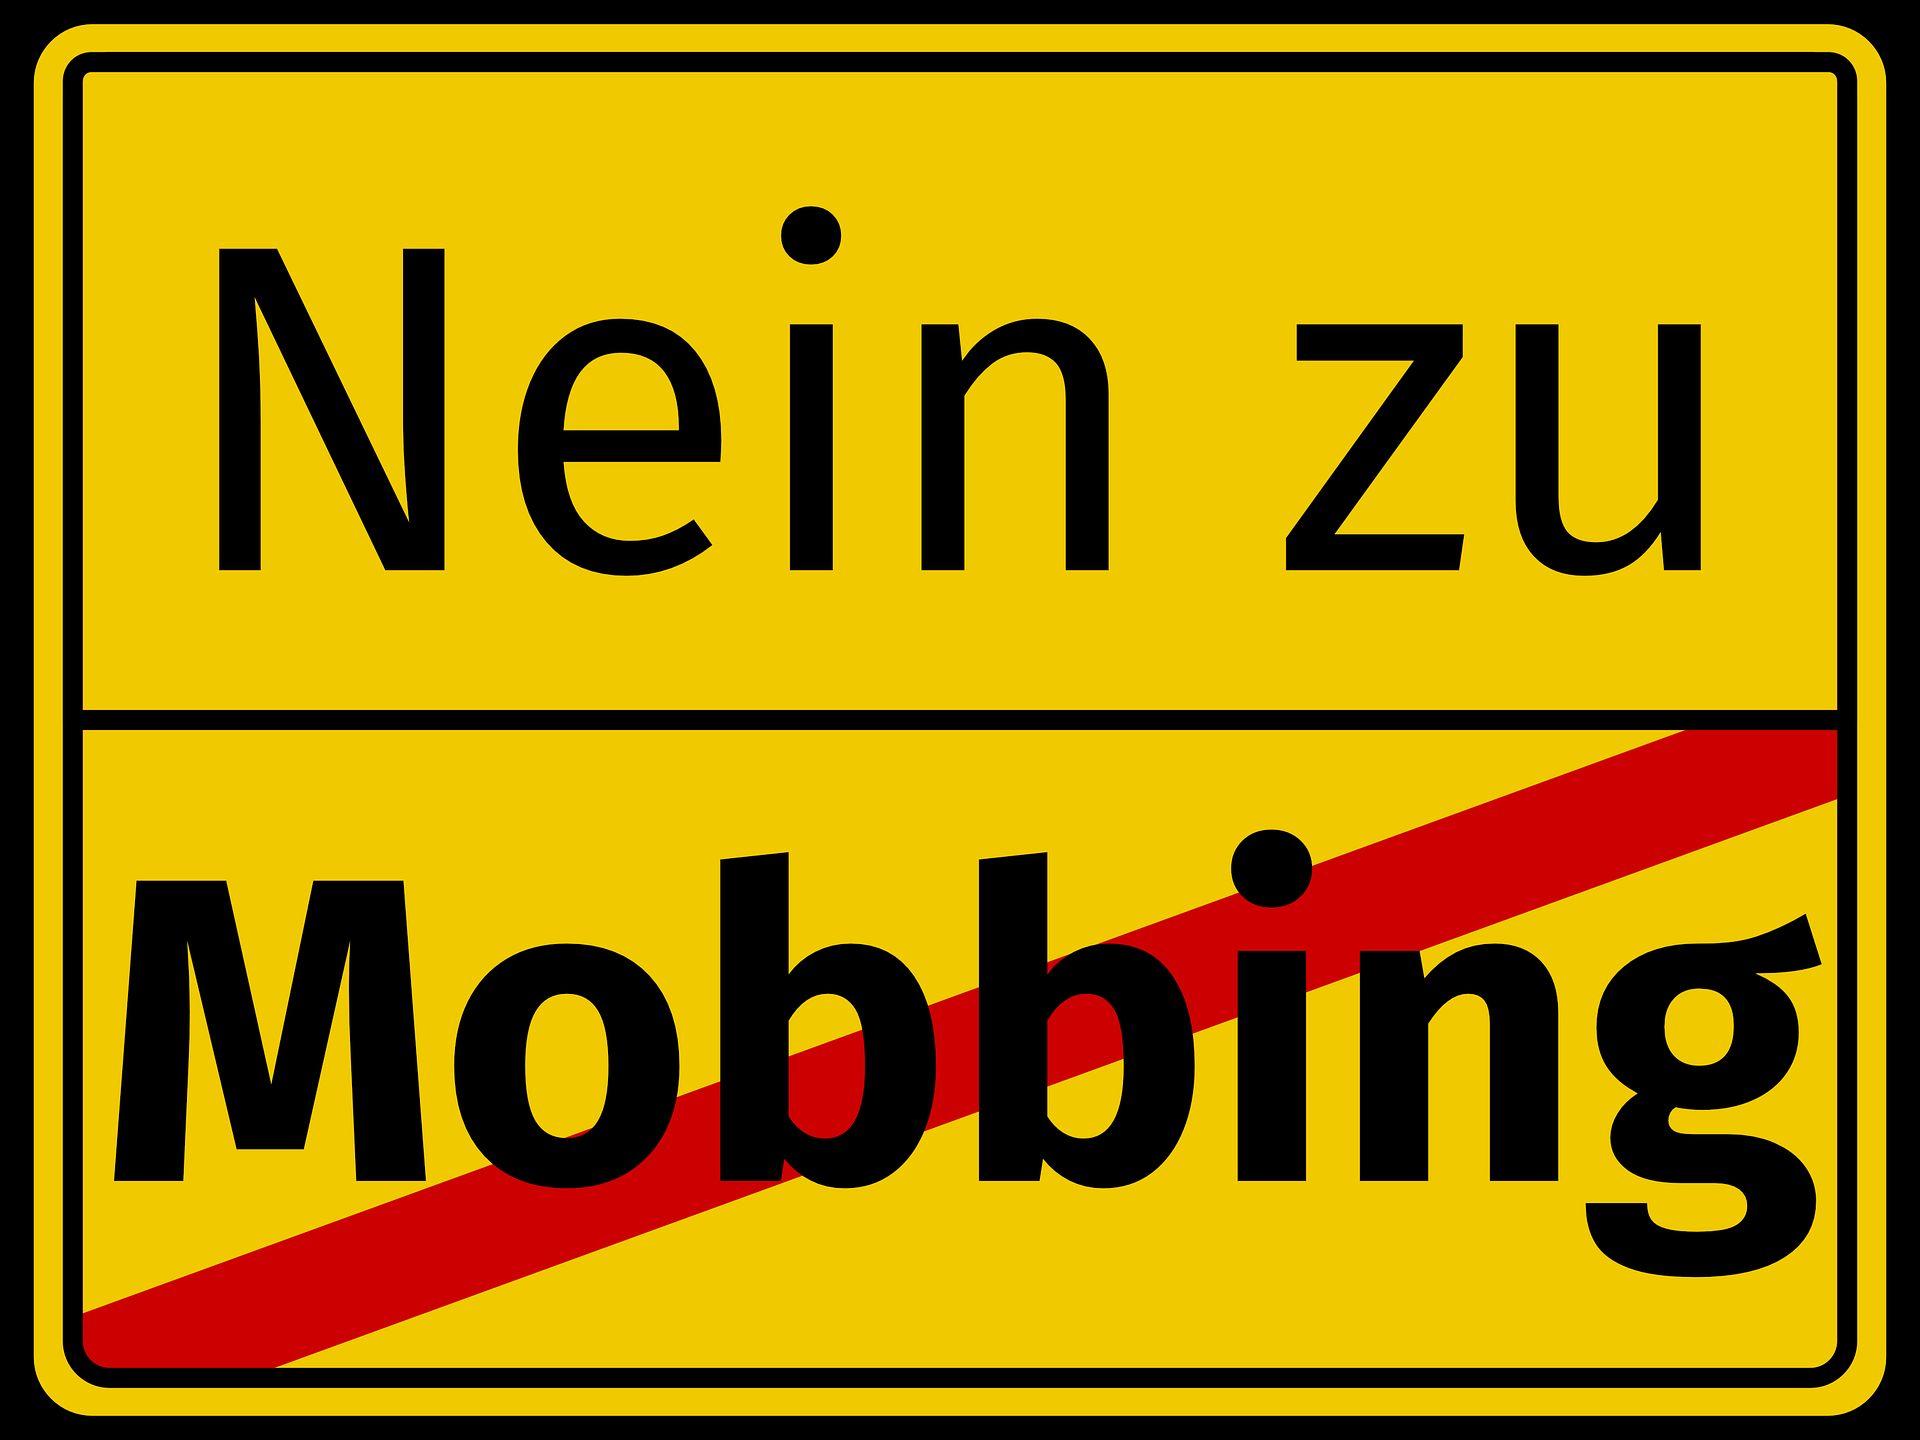 Mobbing Nein danke